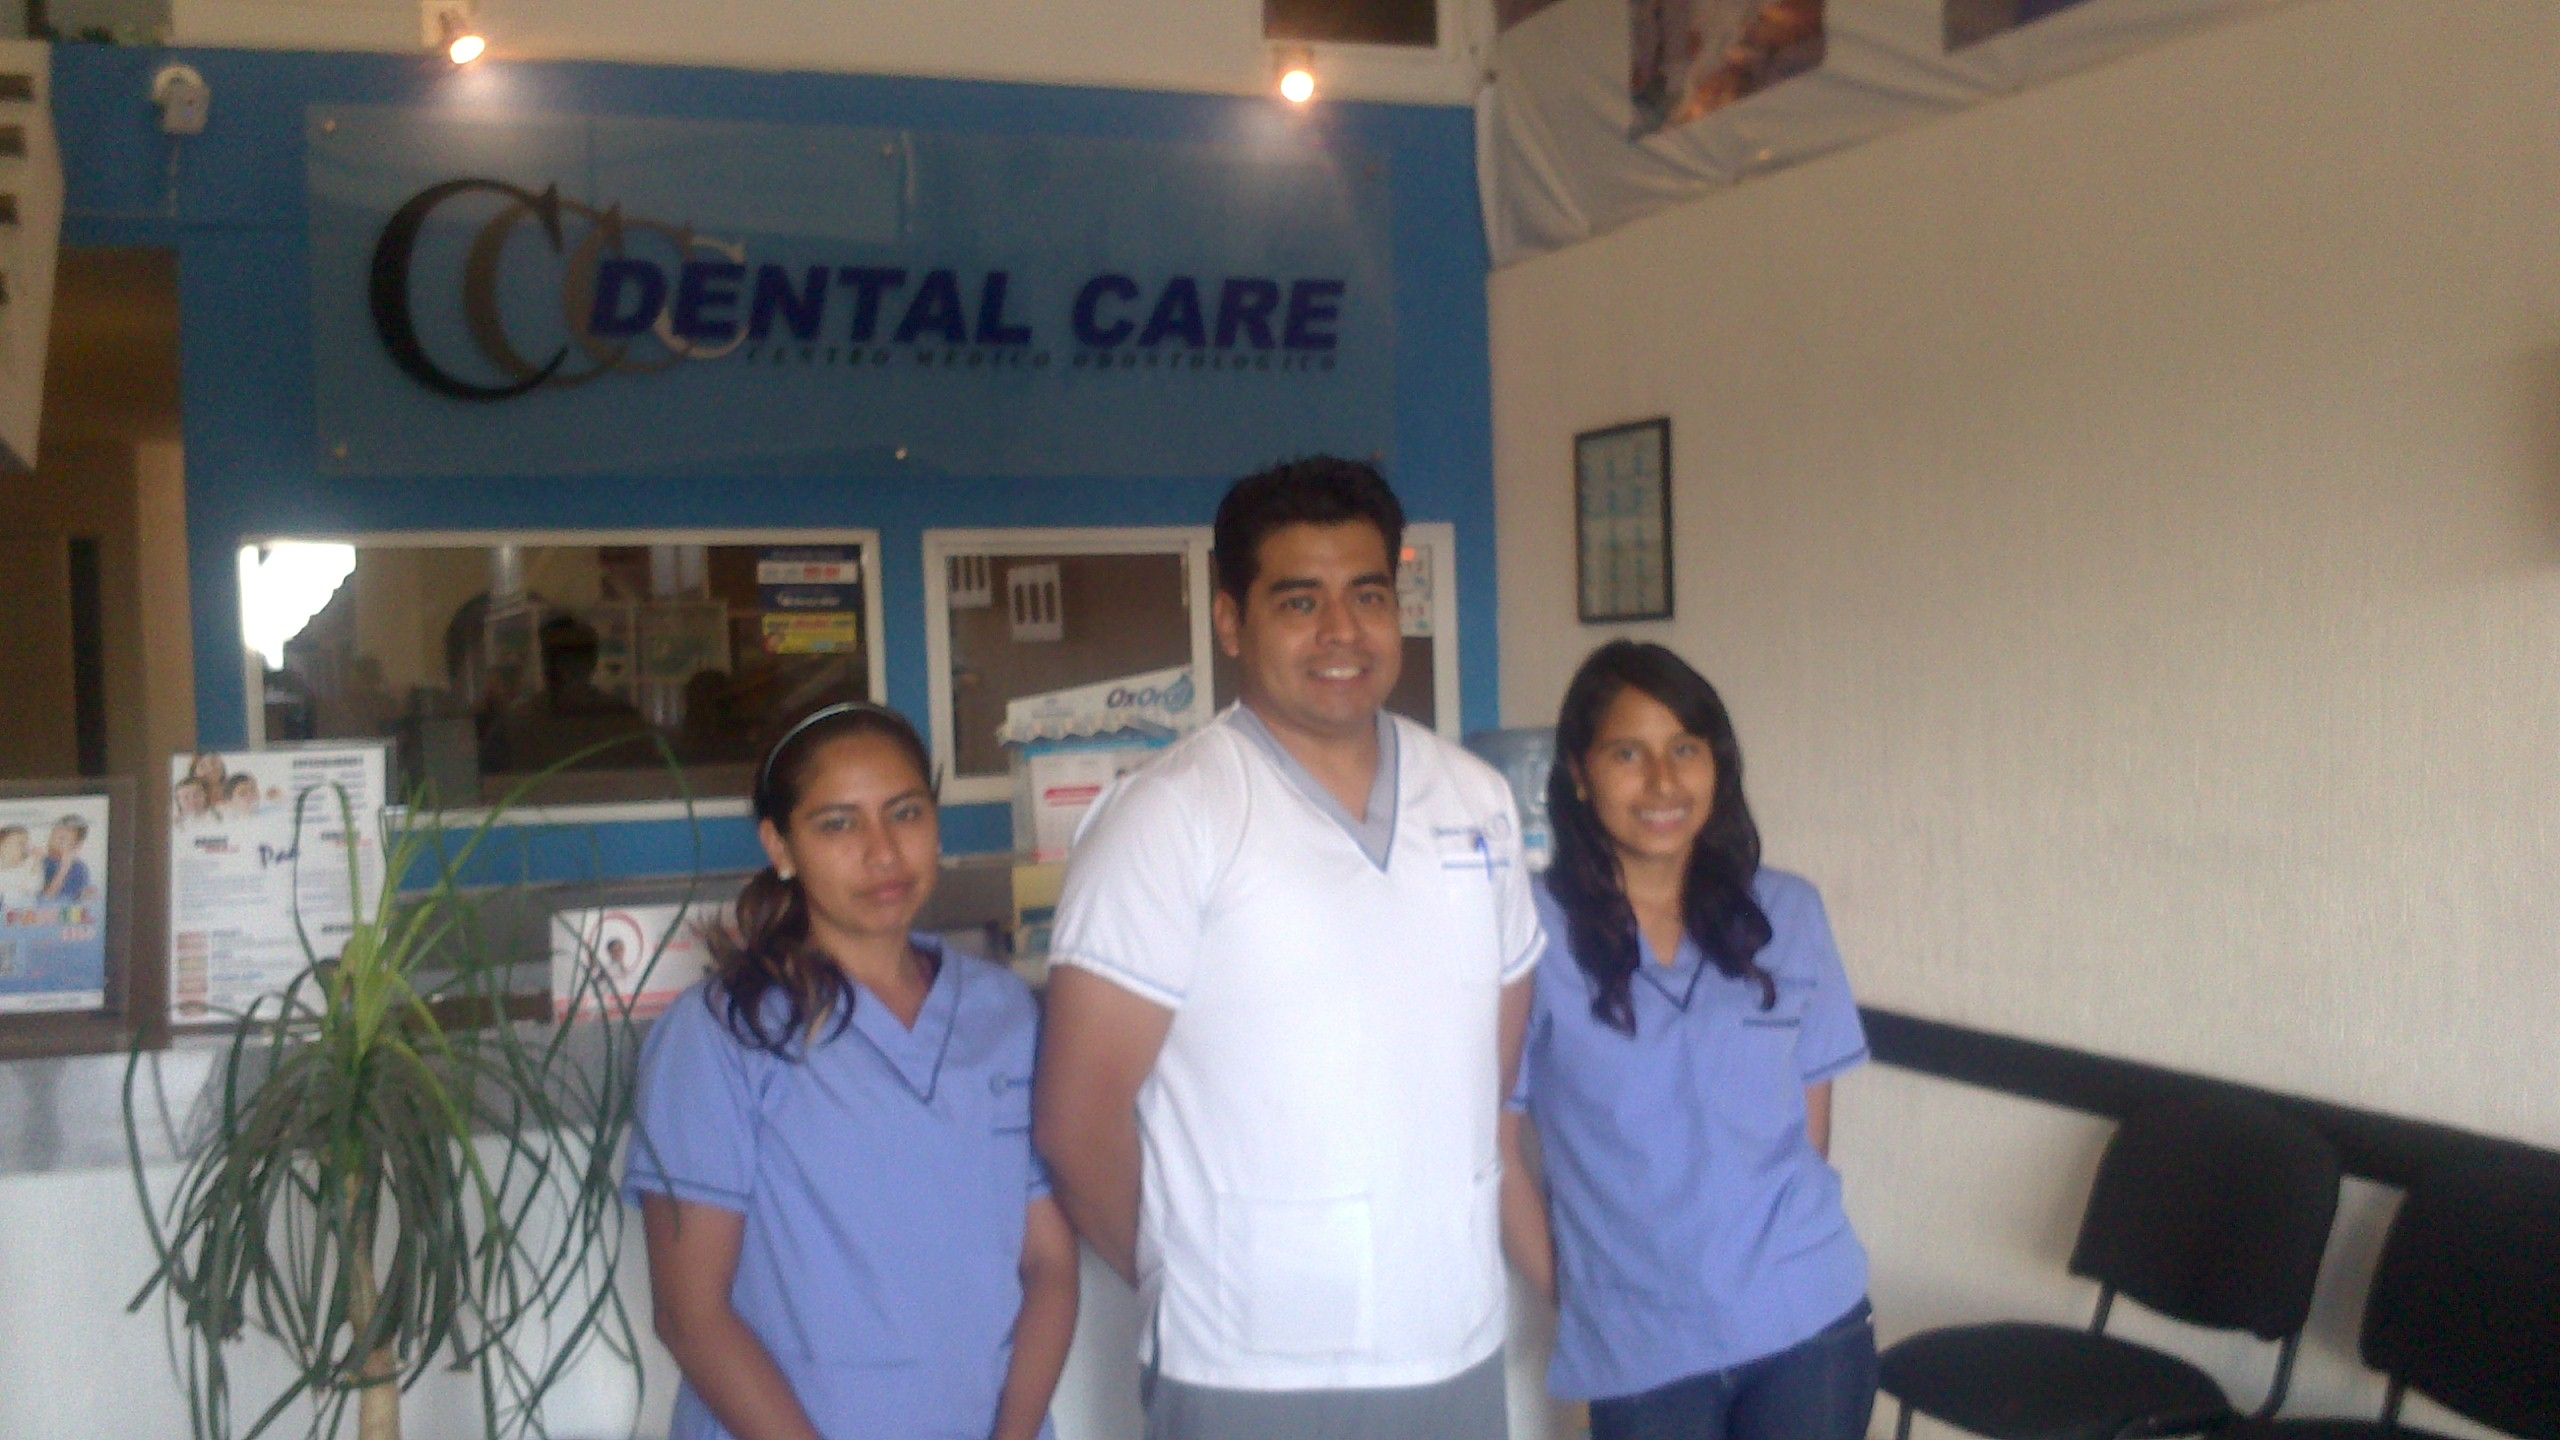 C Dental Care - Cuautla